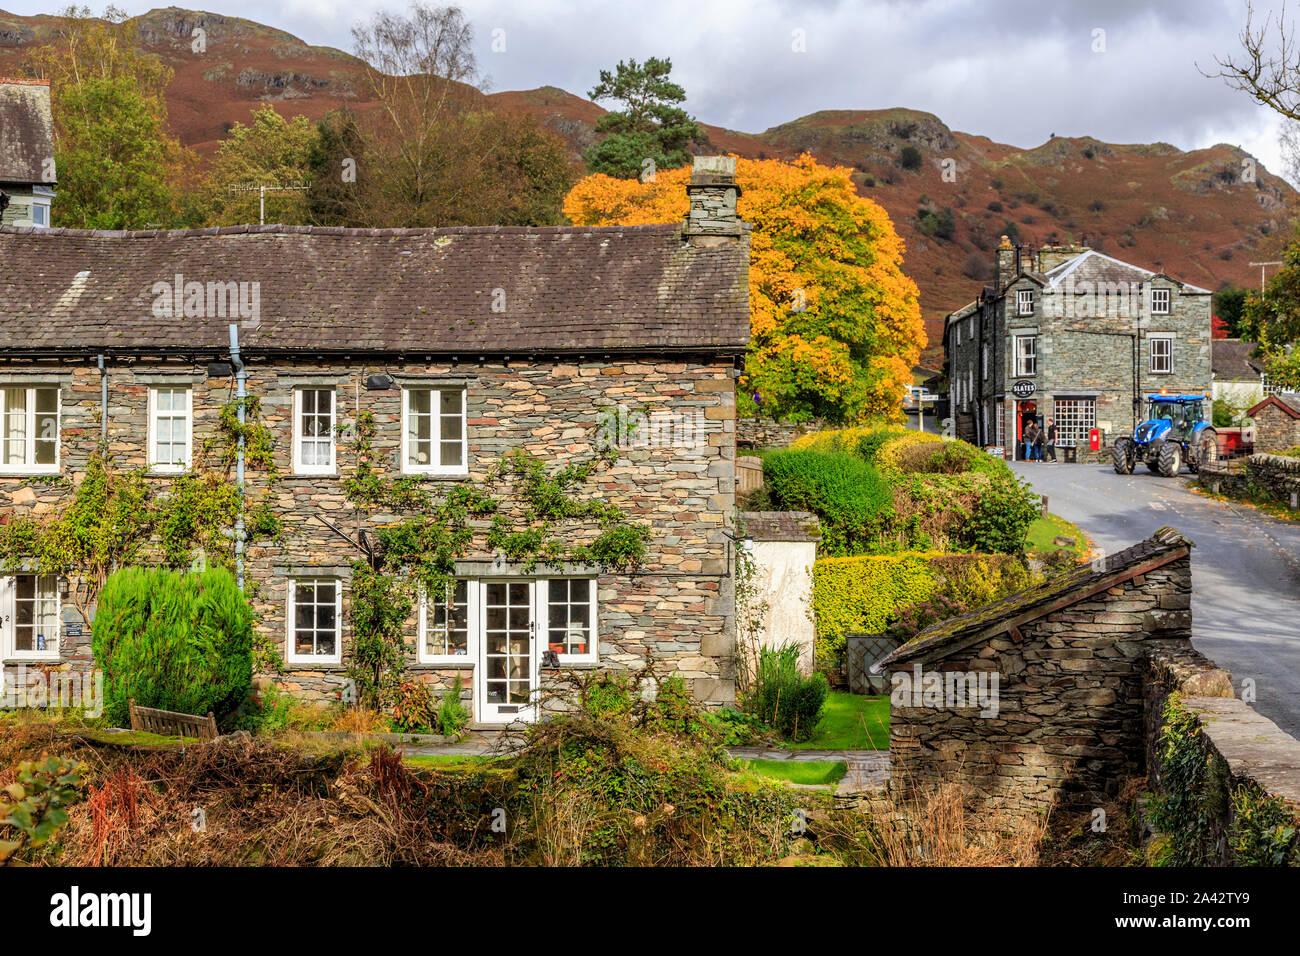 elterwater village,great langdale valley,lake district national park, cumbria, england, uk gb Stock Photo